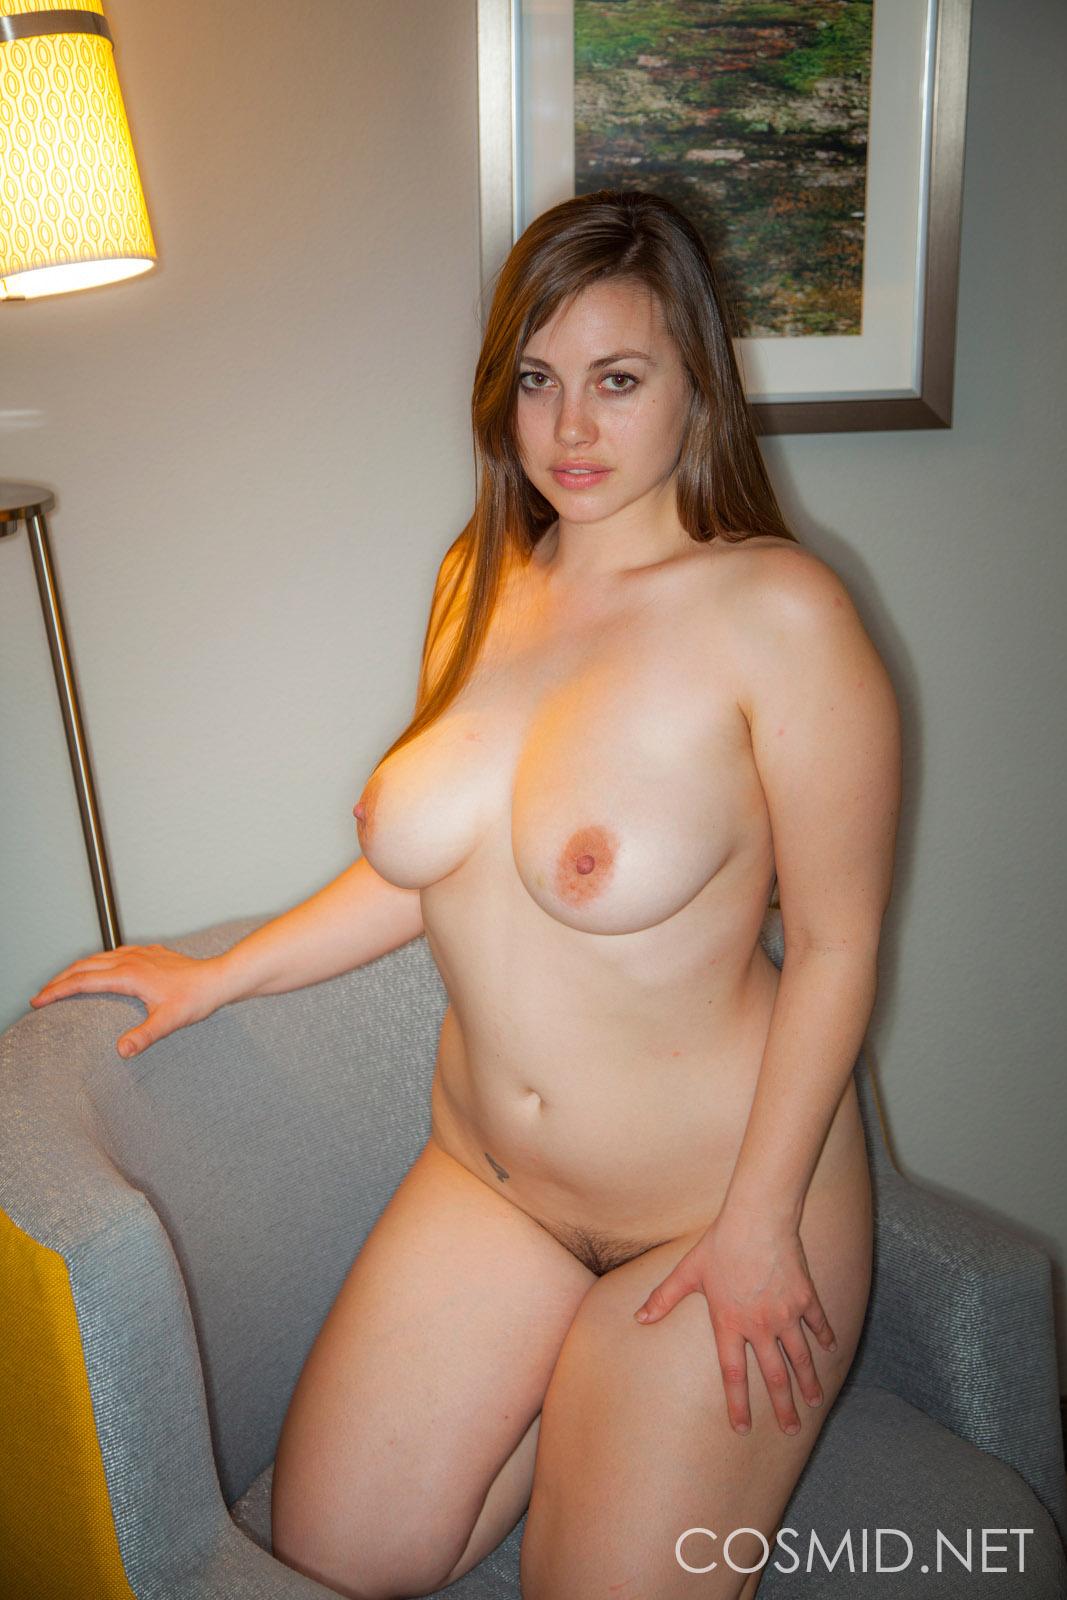 Brasilena showing off her hot body 6